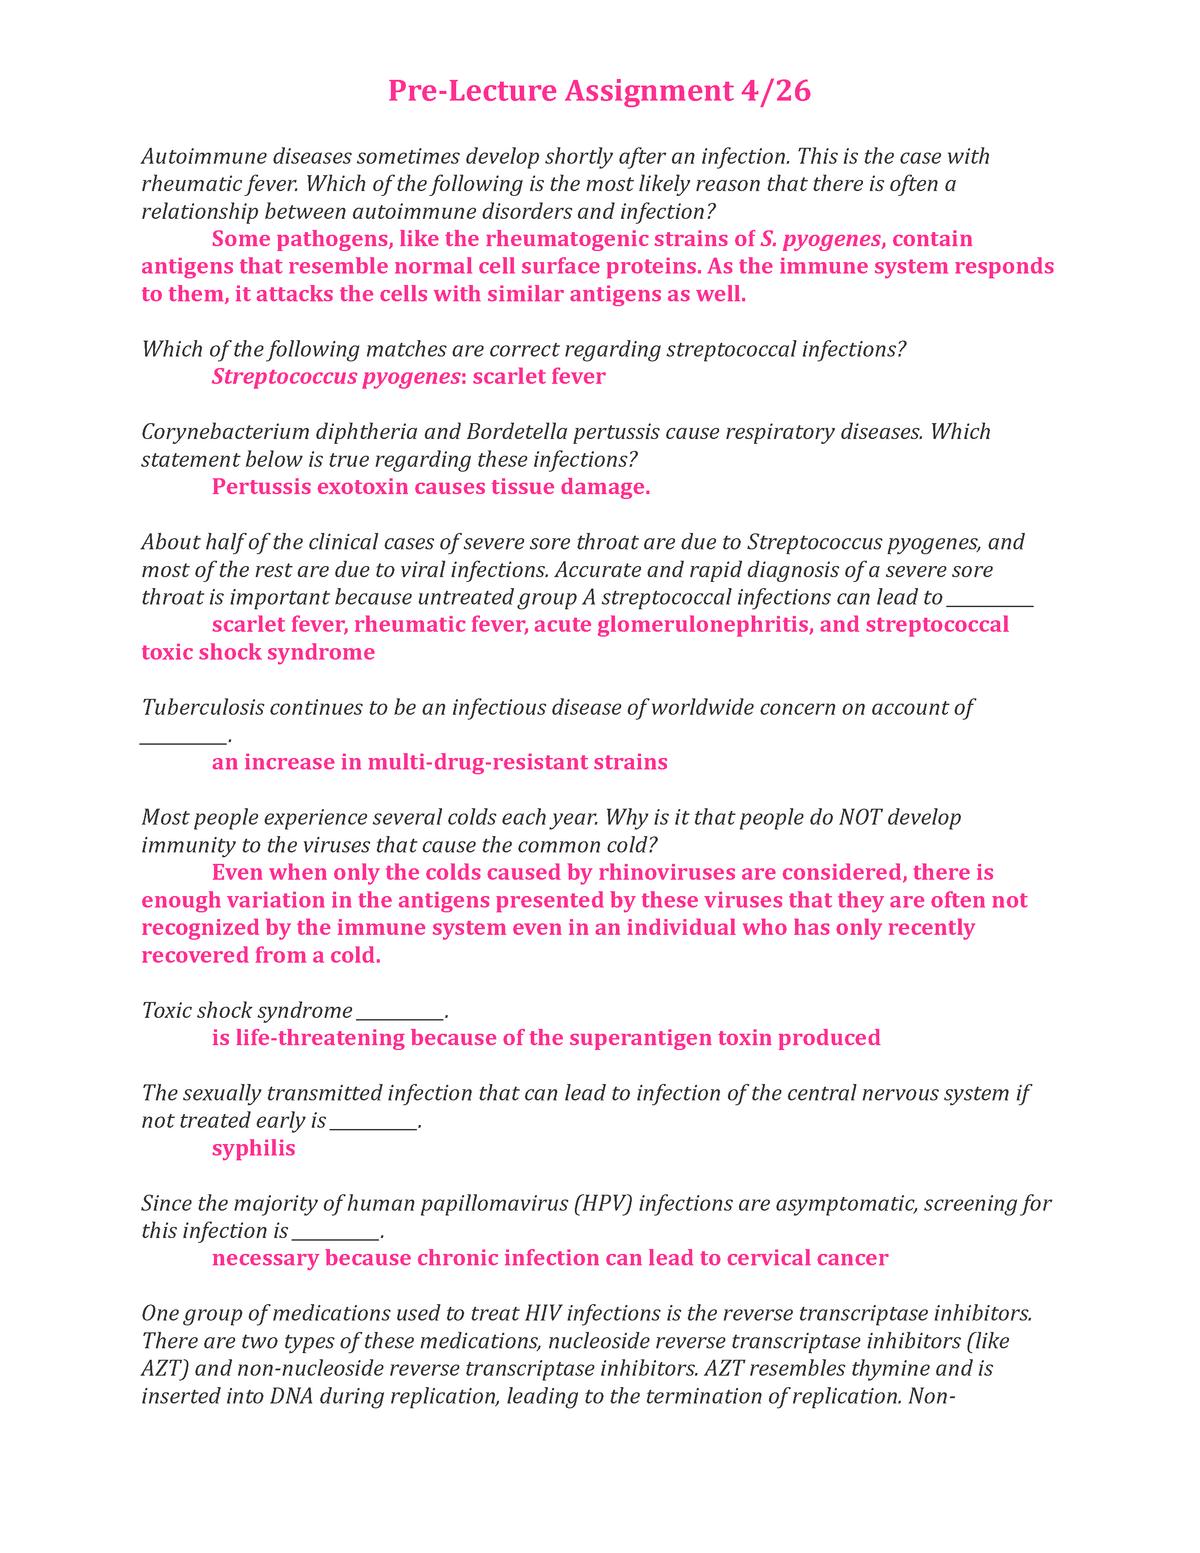 Pre Lecture Assignmnet 4:26 - BIOL 307: Microbiology - StuDocu